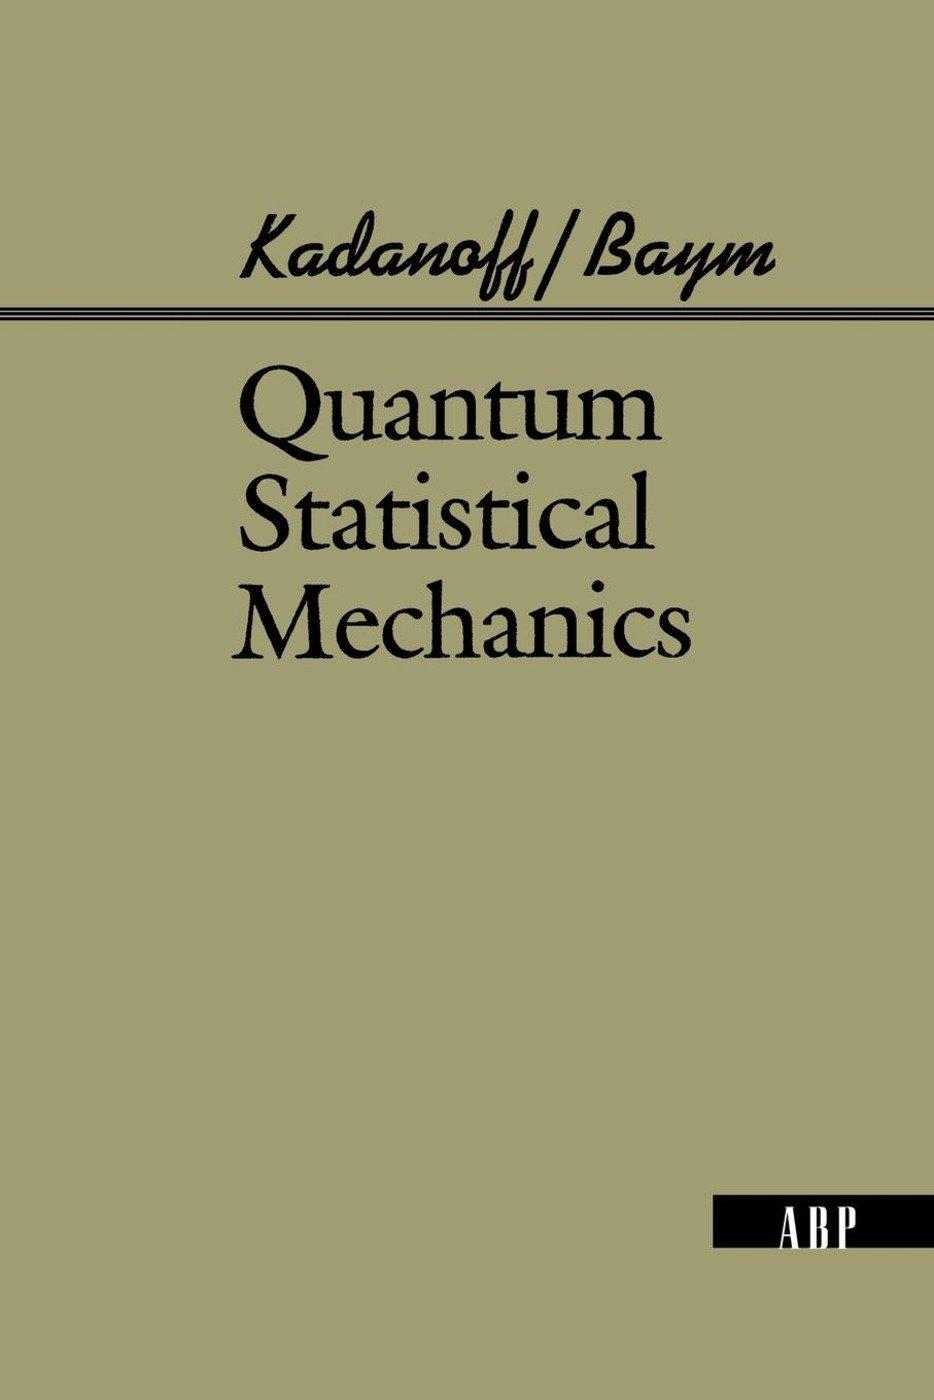 Quantum Statistical Mechanics: 1st Edition (Paperback) book cover